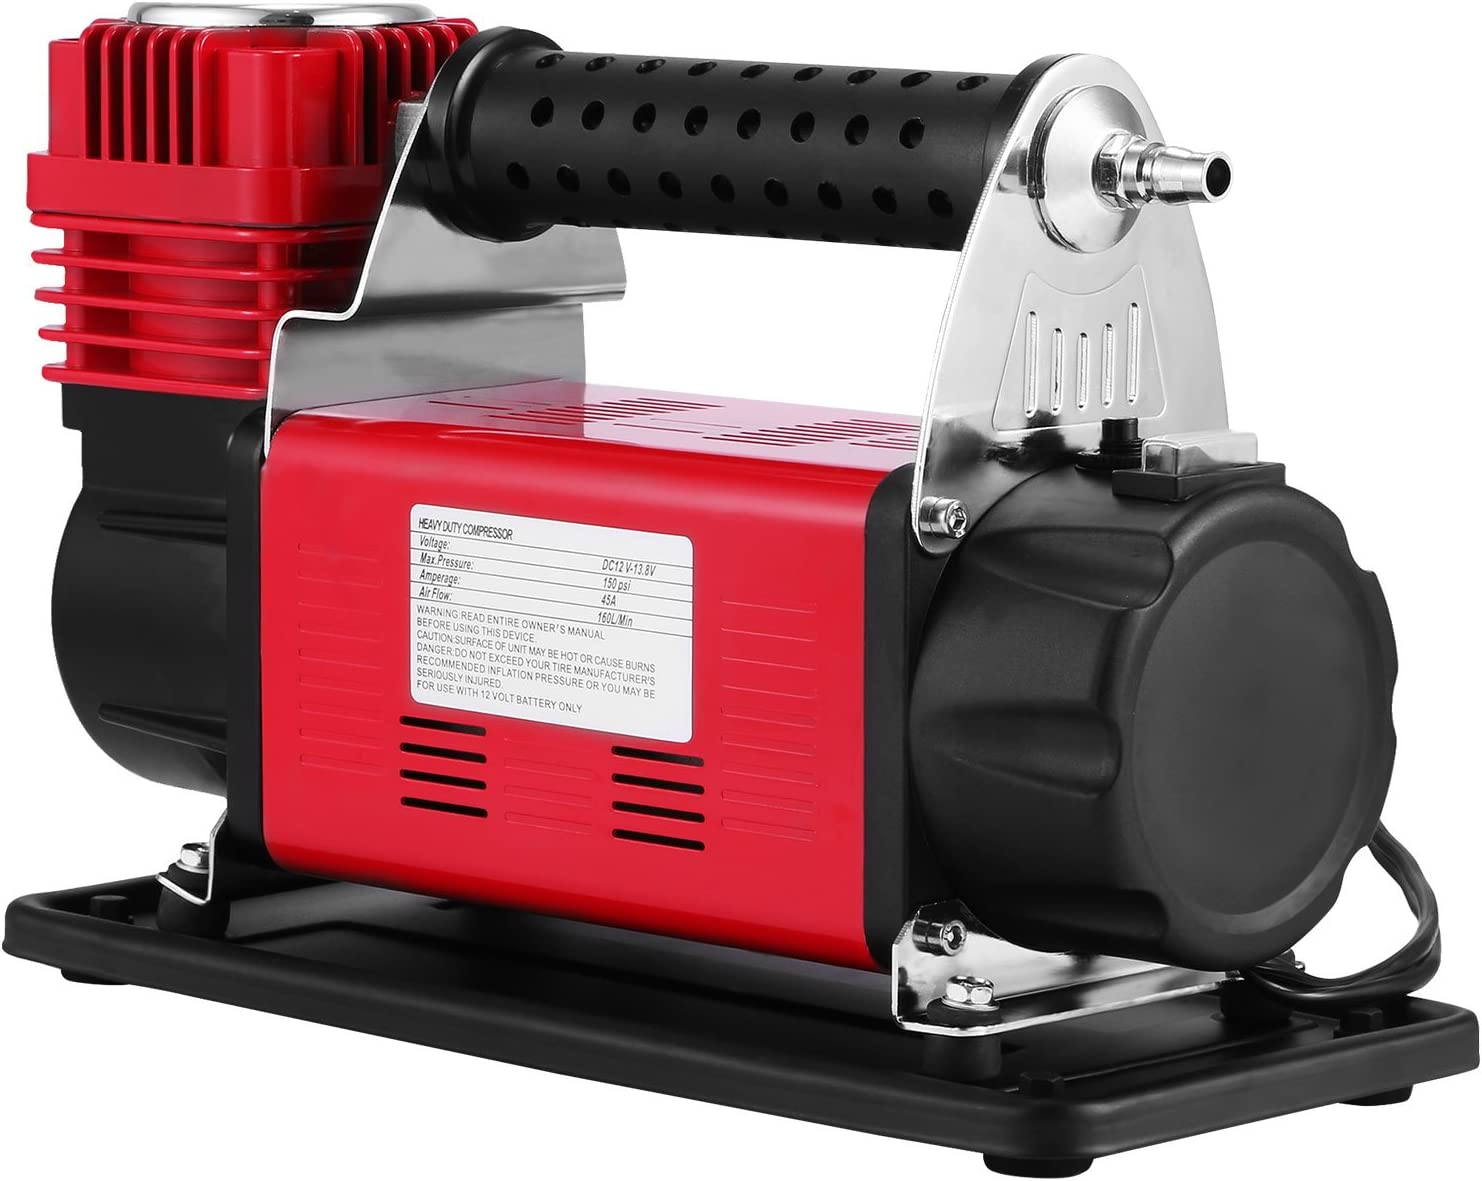 Mophorn Compresor de Aire Portátil para Trabajo Pesado 12 V Bomba de Aire Kit de Compresor de Aire Mini Compresor de Aire